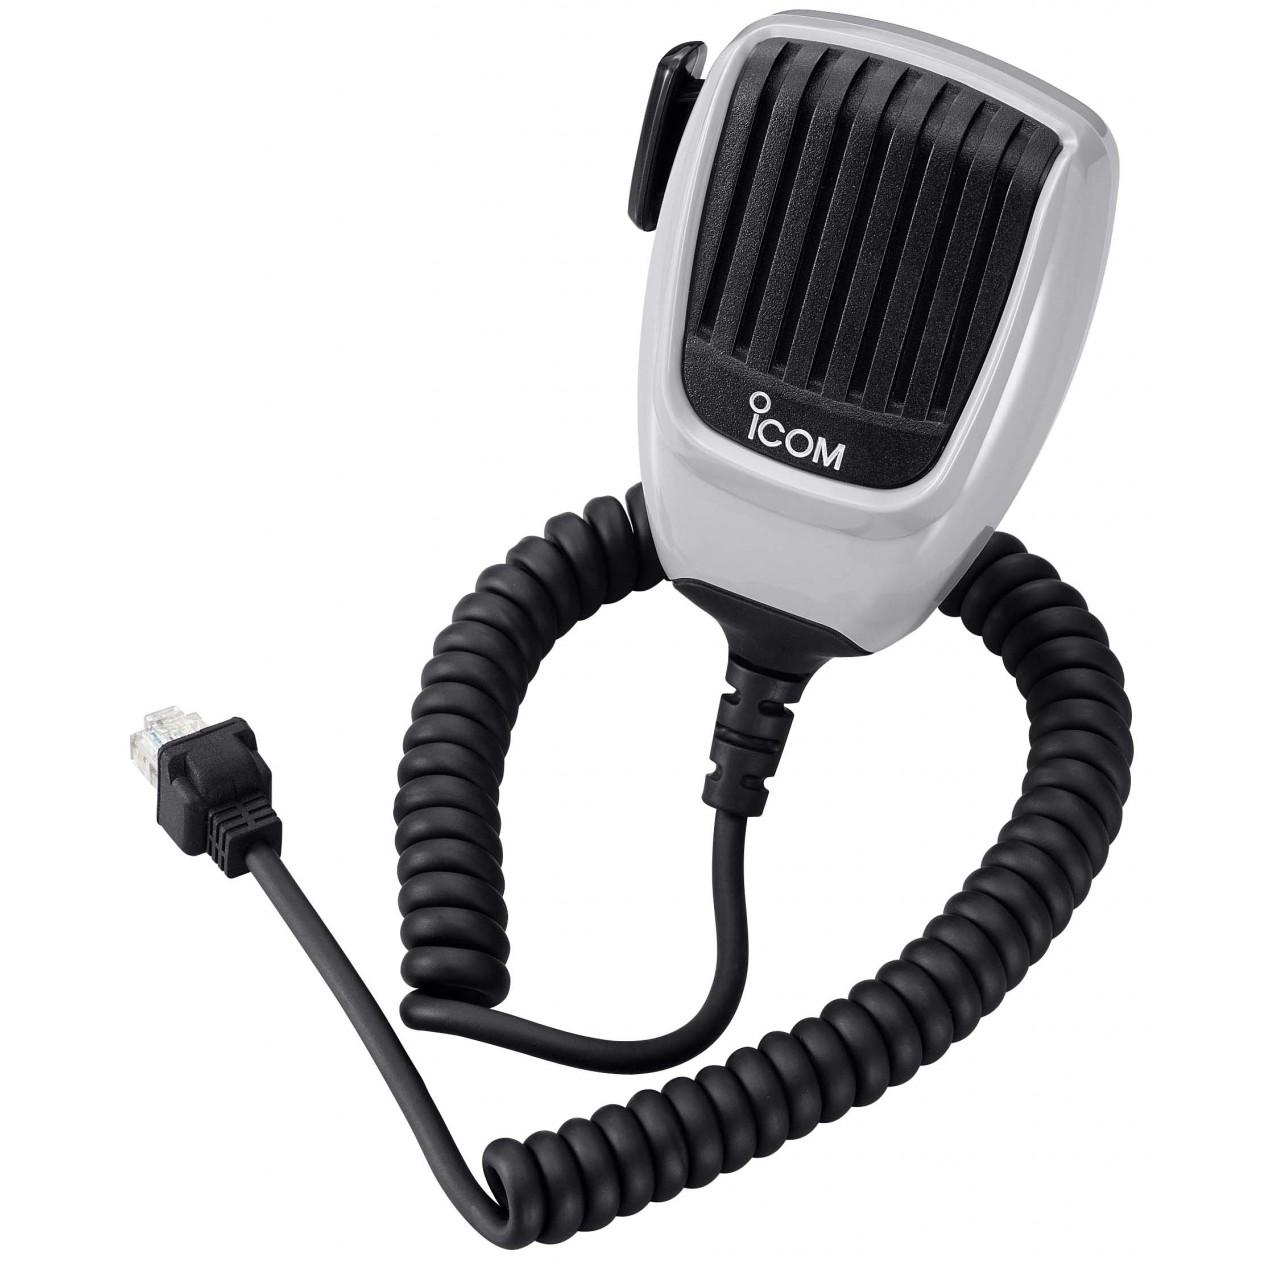 HM-148G Microphones - ICOM